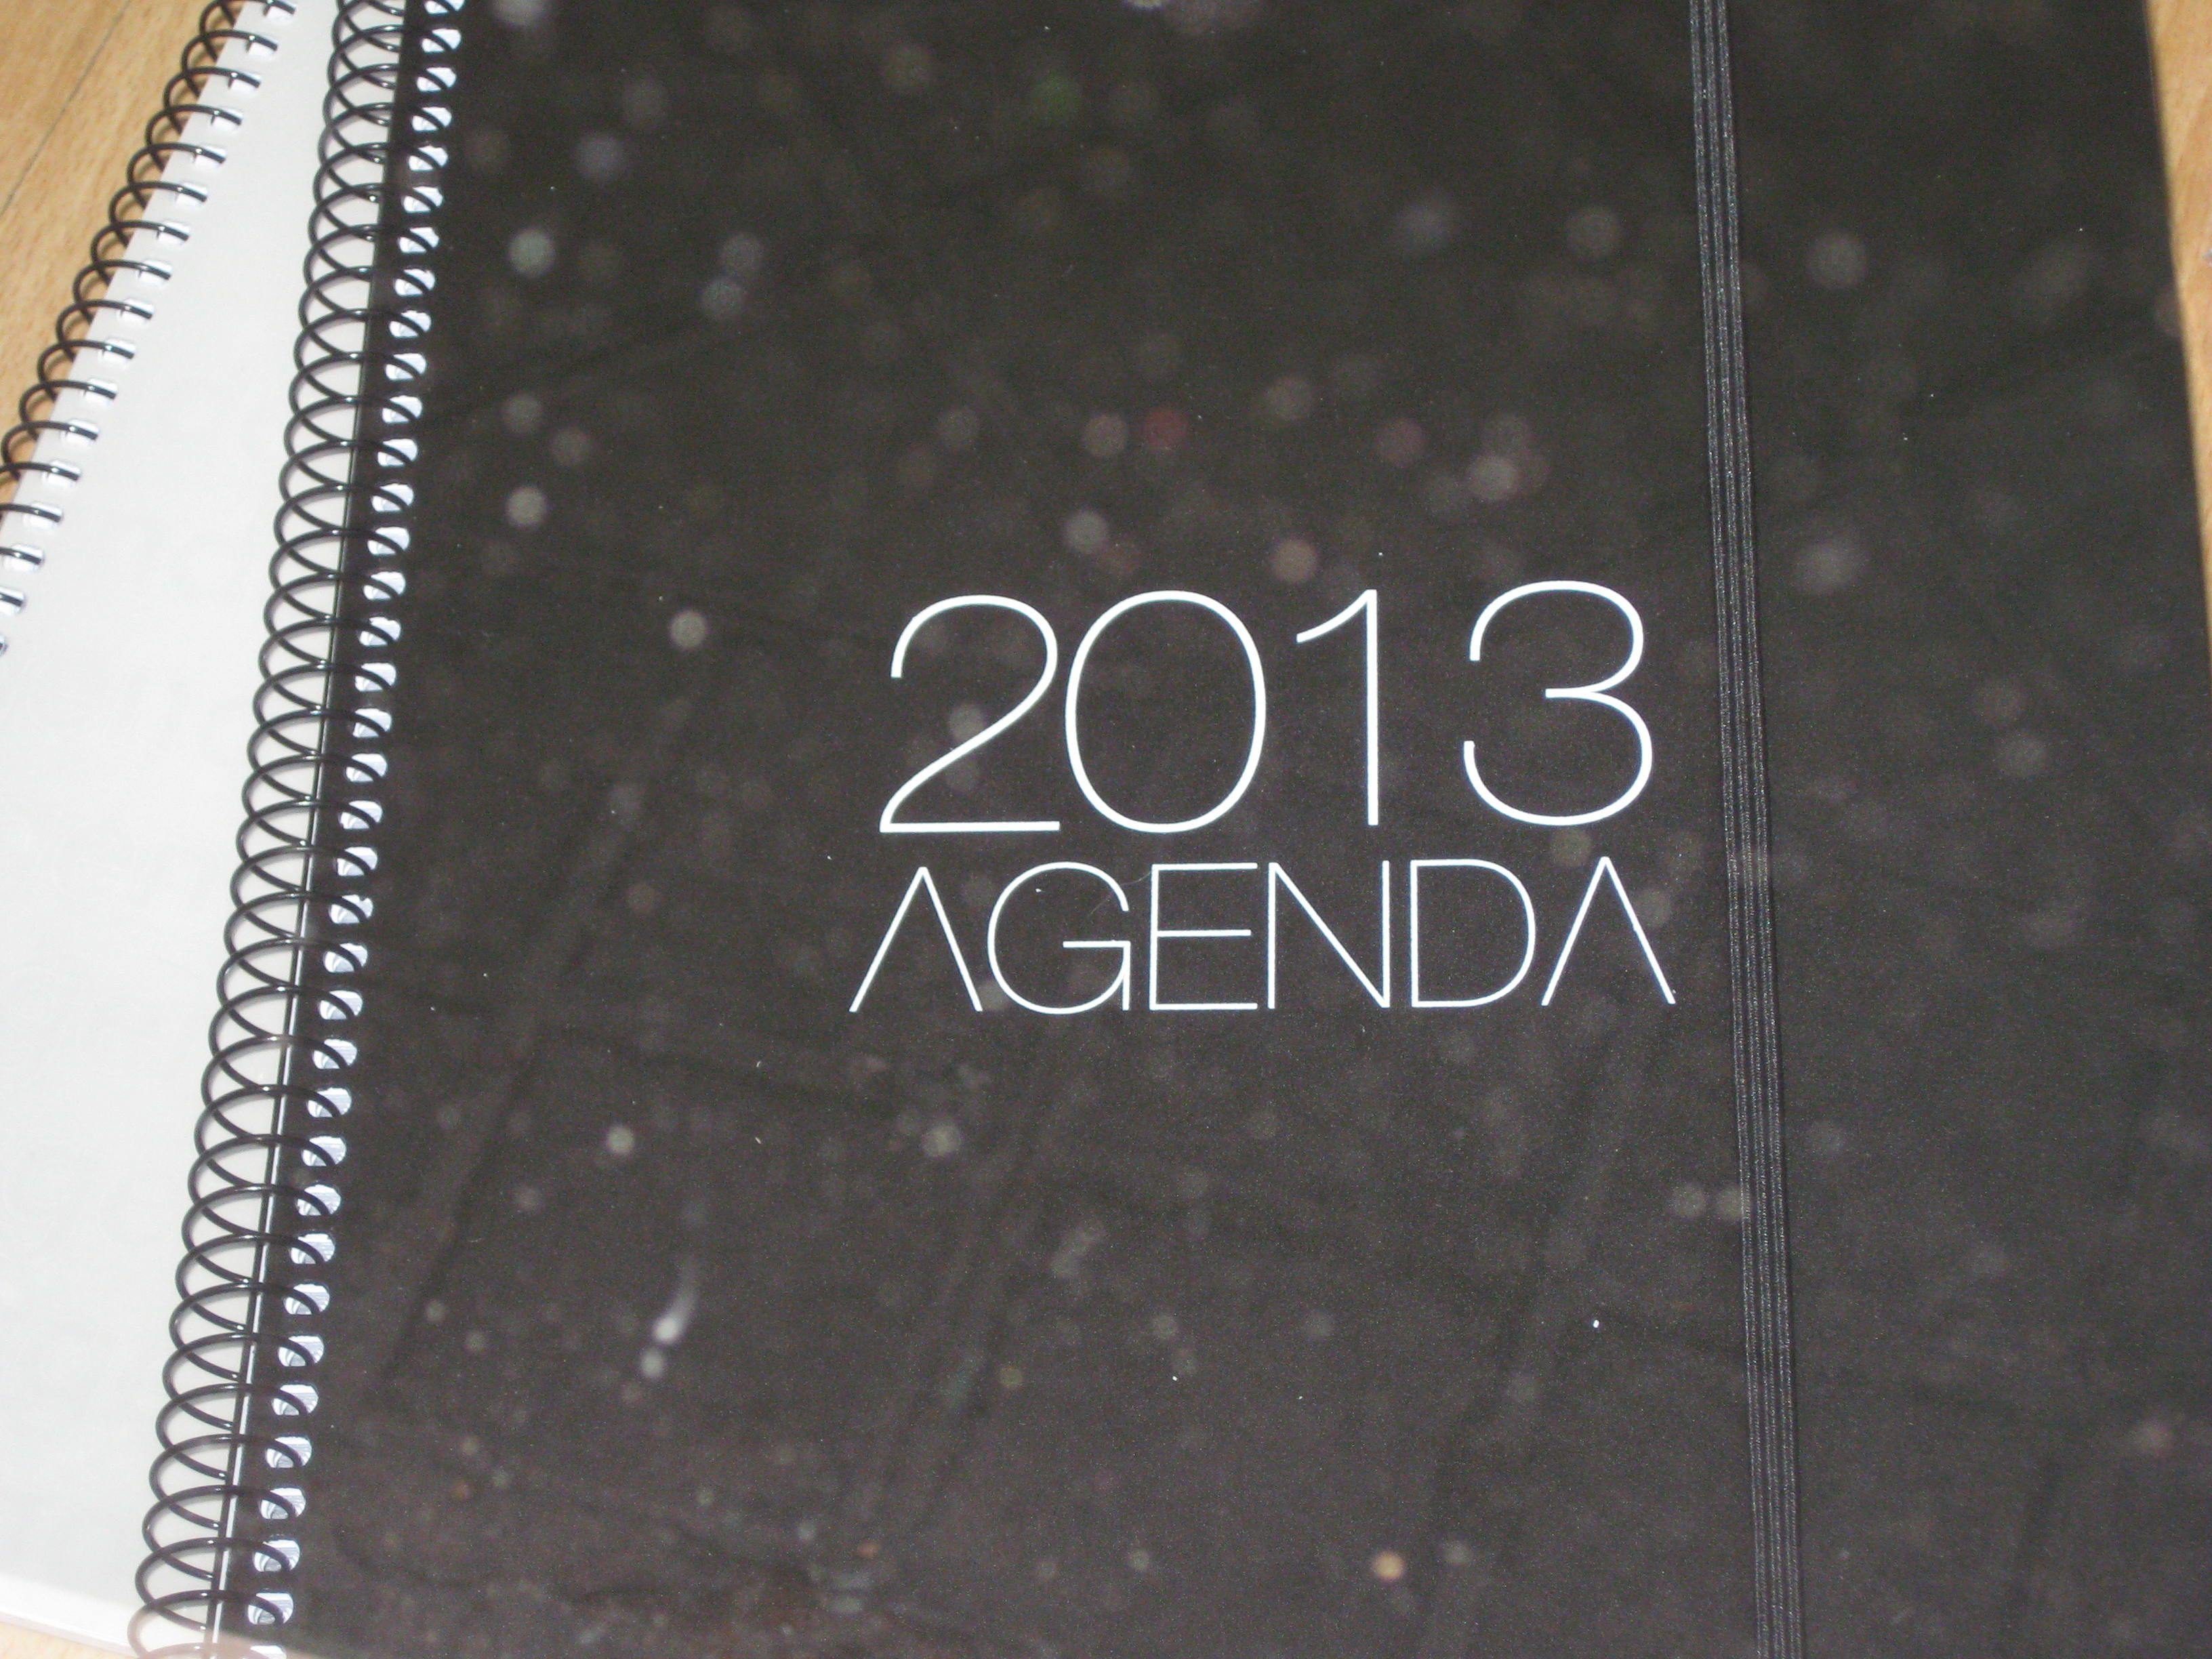 Agenda Colorea Negra